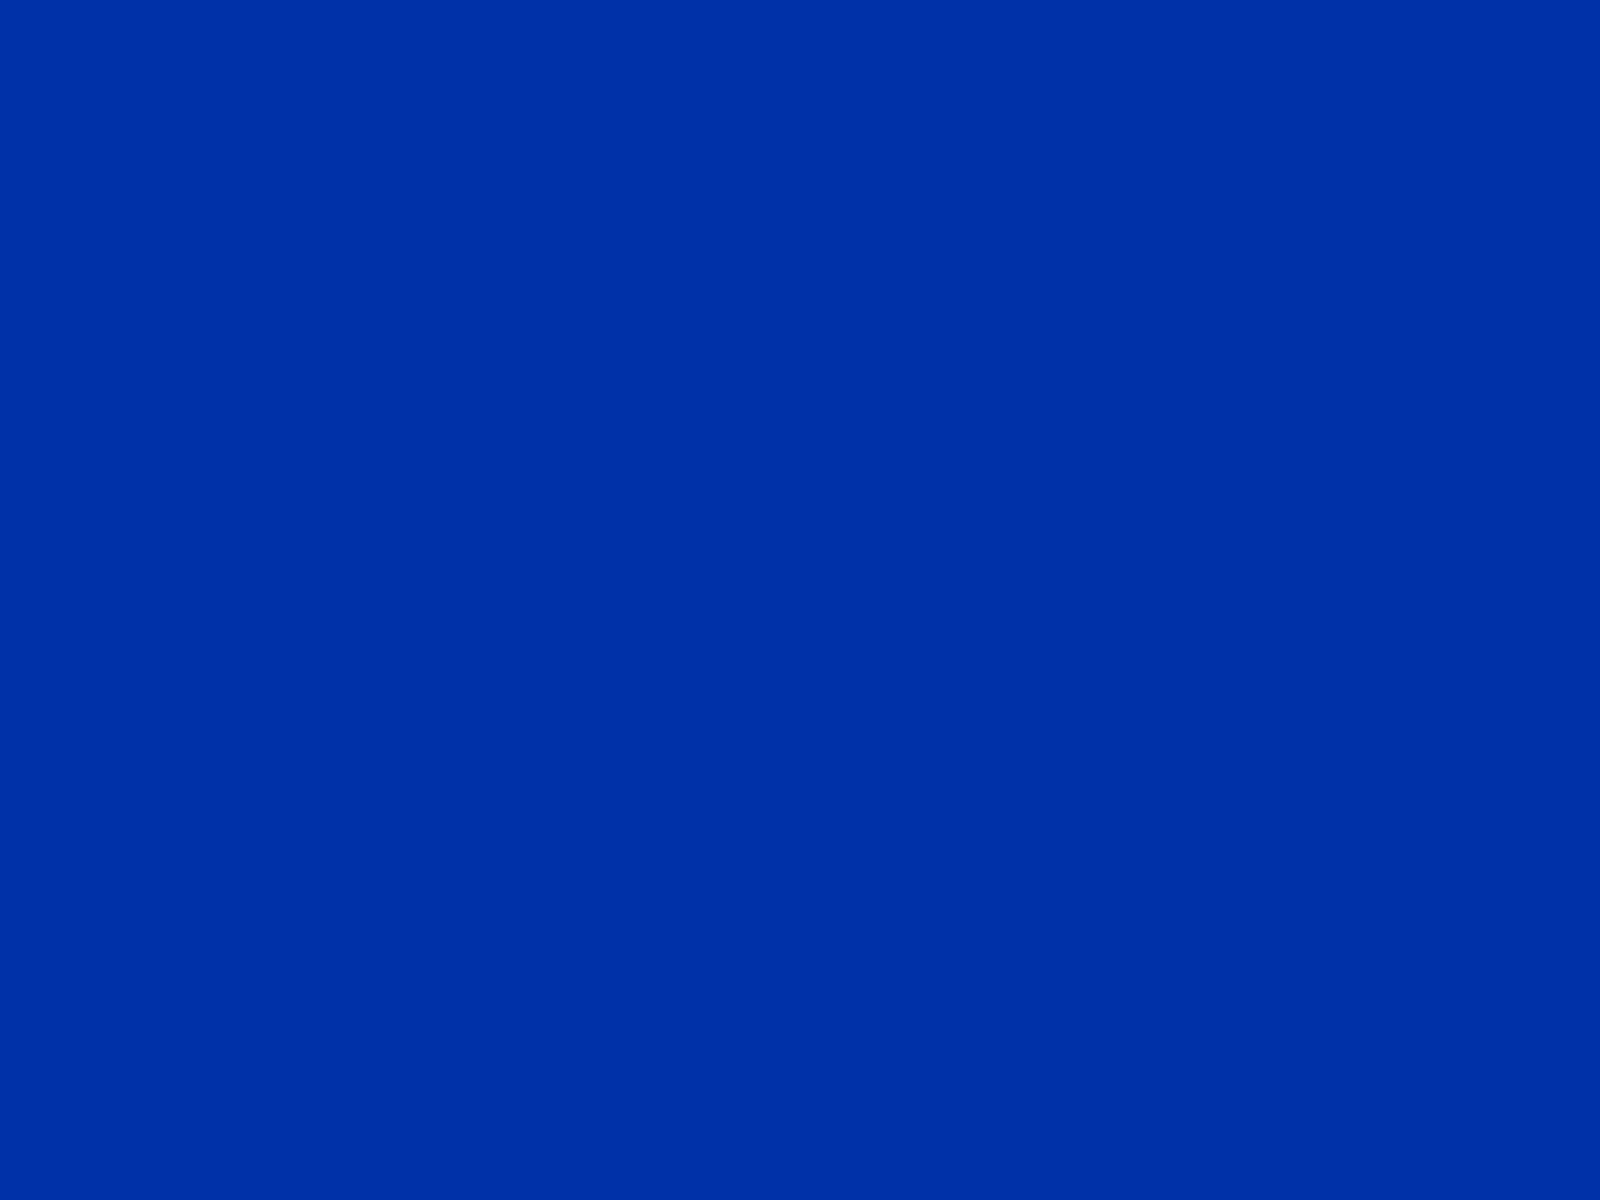 1600x1200 International Klein Blue Solid Color Background